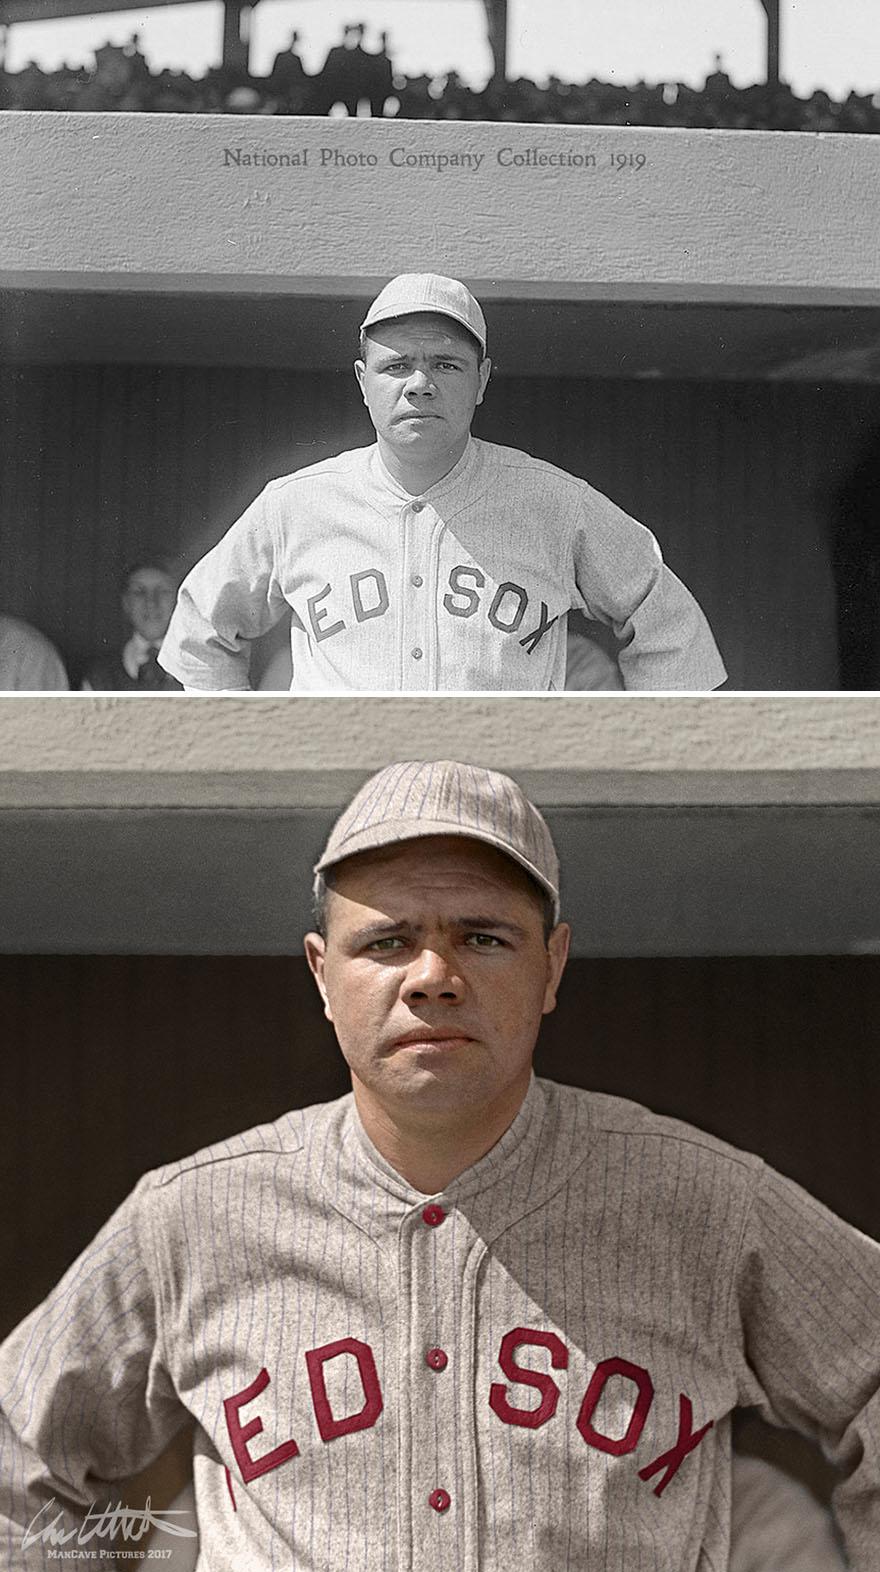 Babe Ruth. Boston Red Sox, 1919